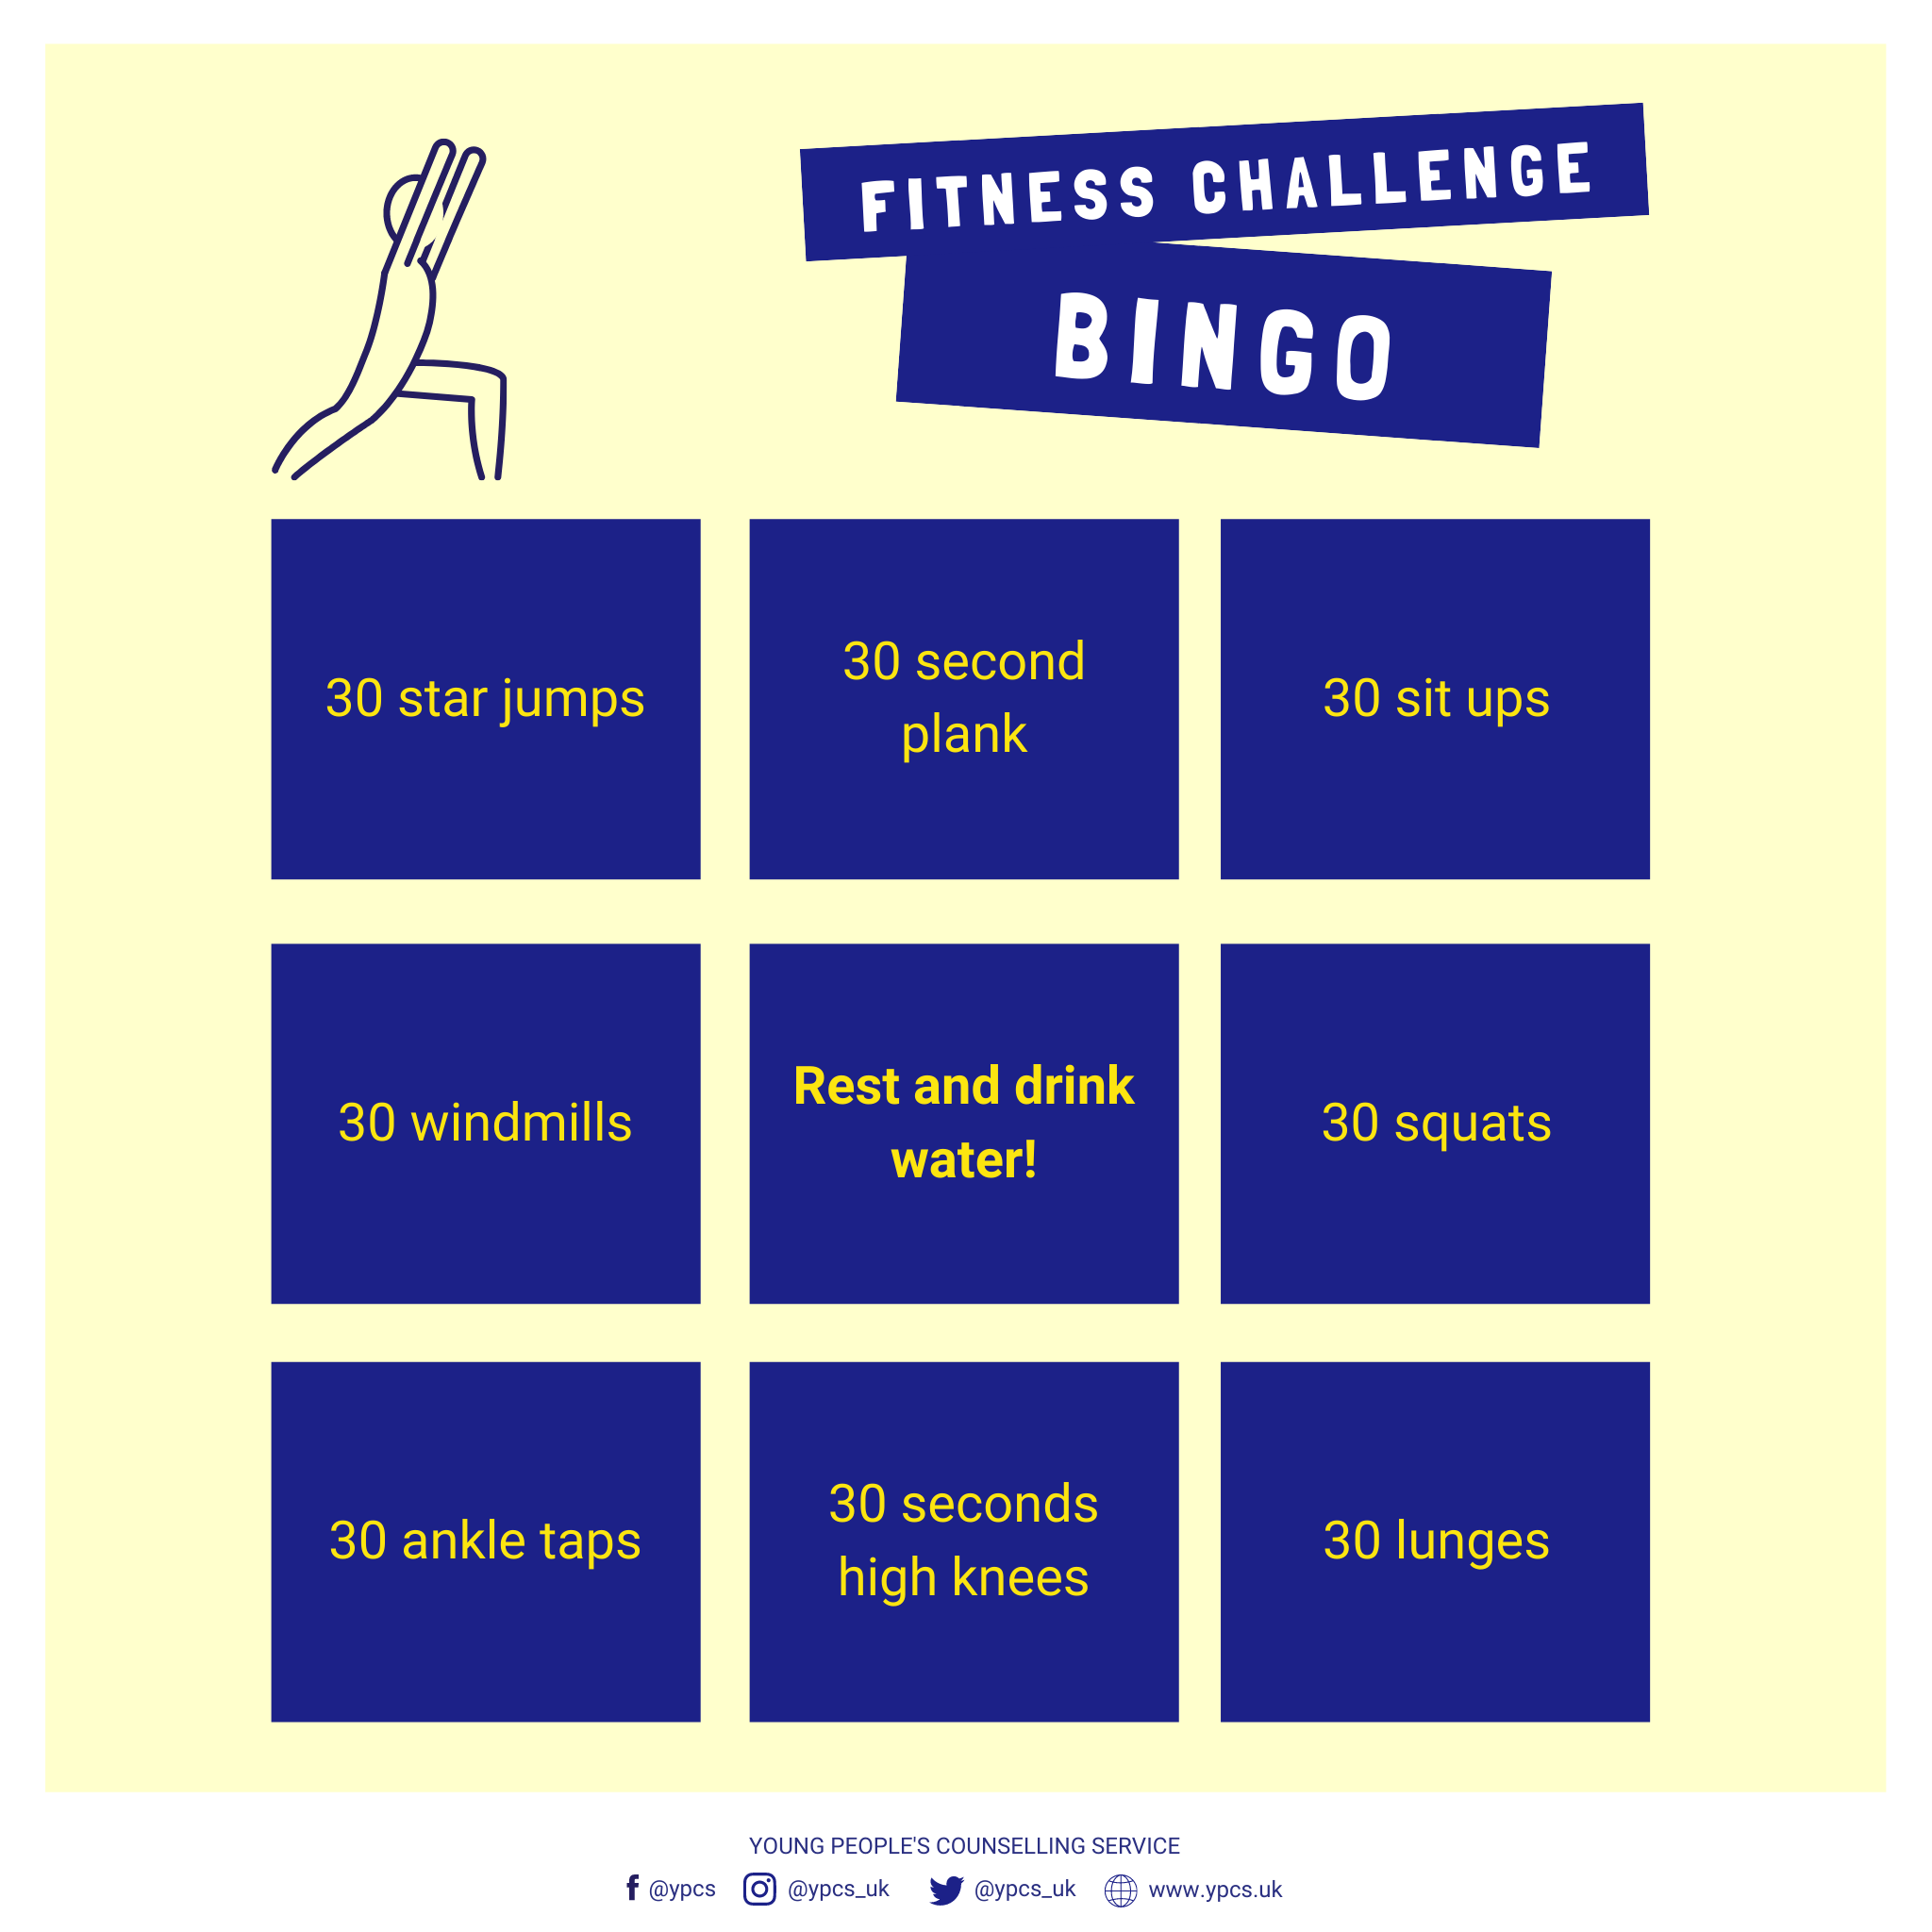 Fitness Challenge Bingo